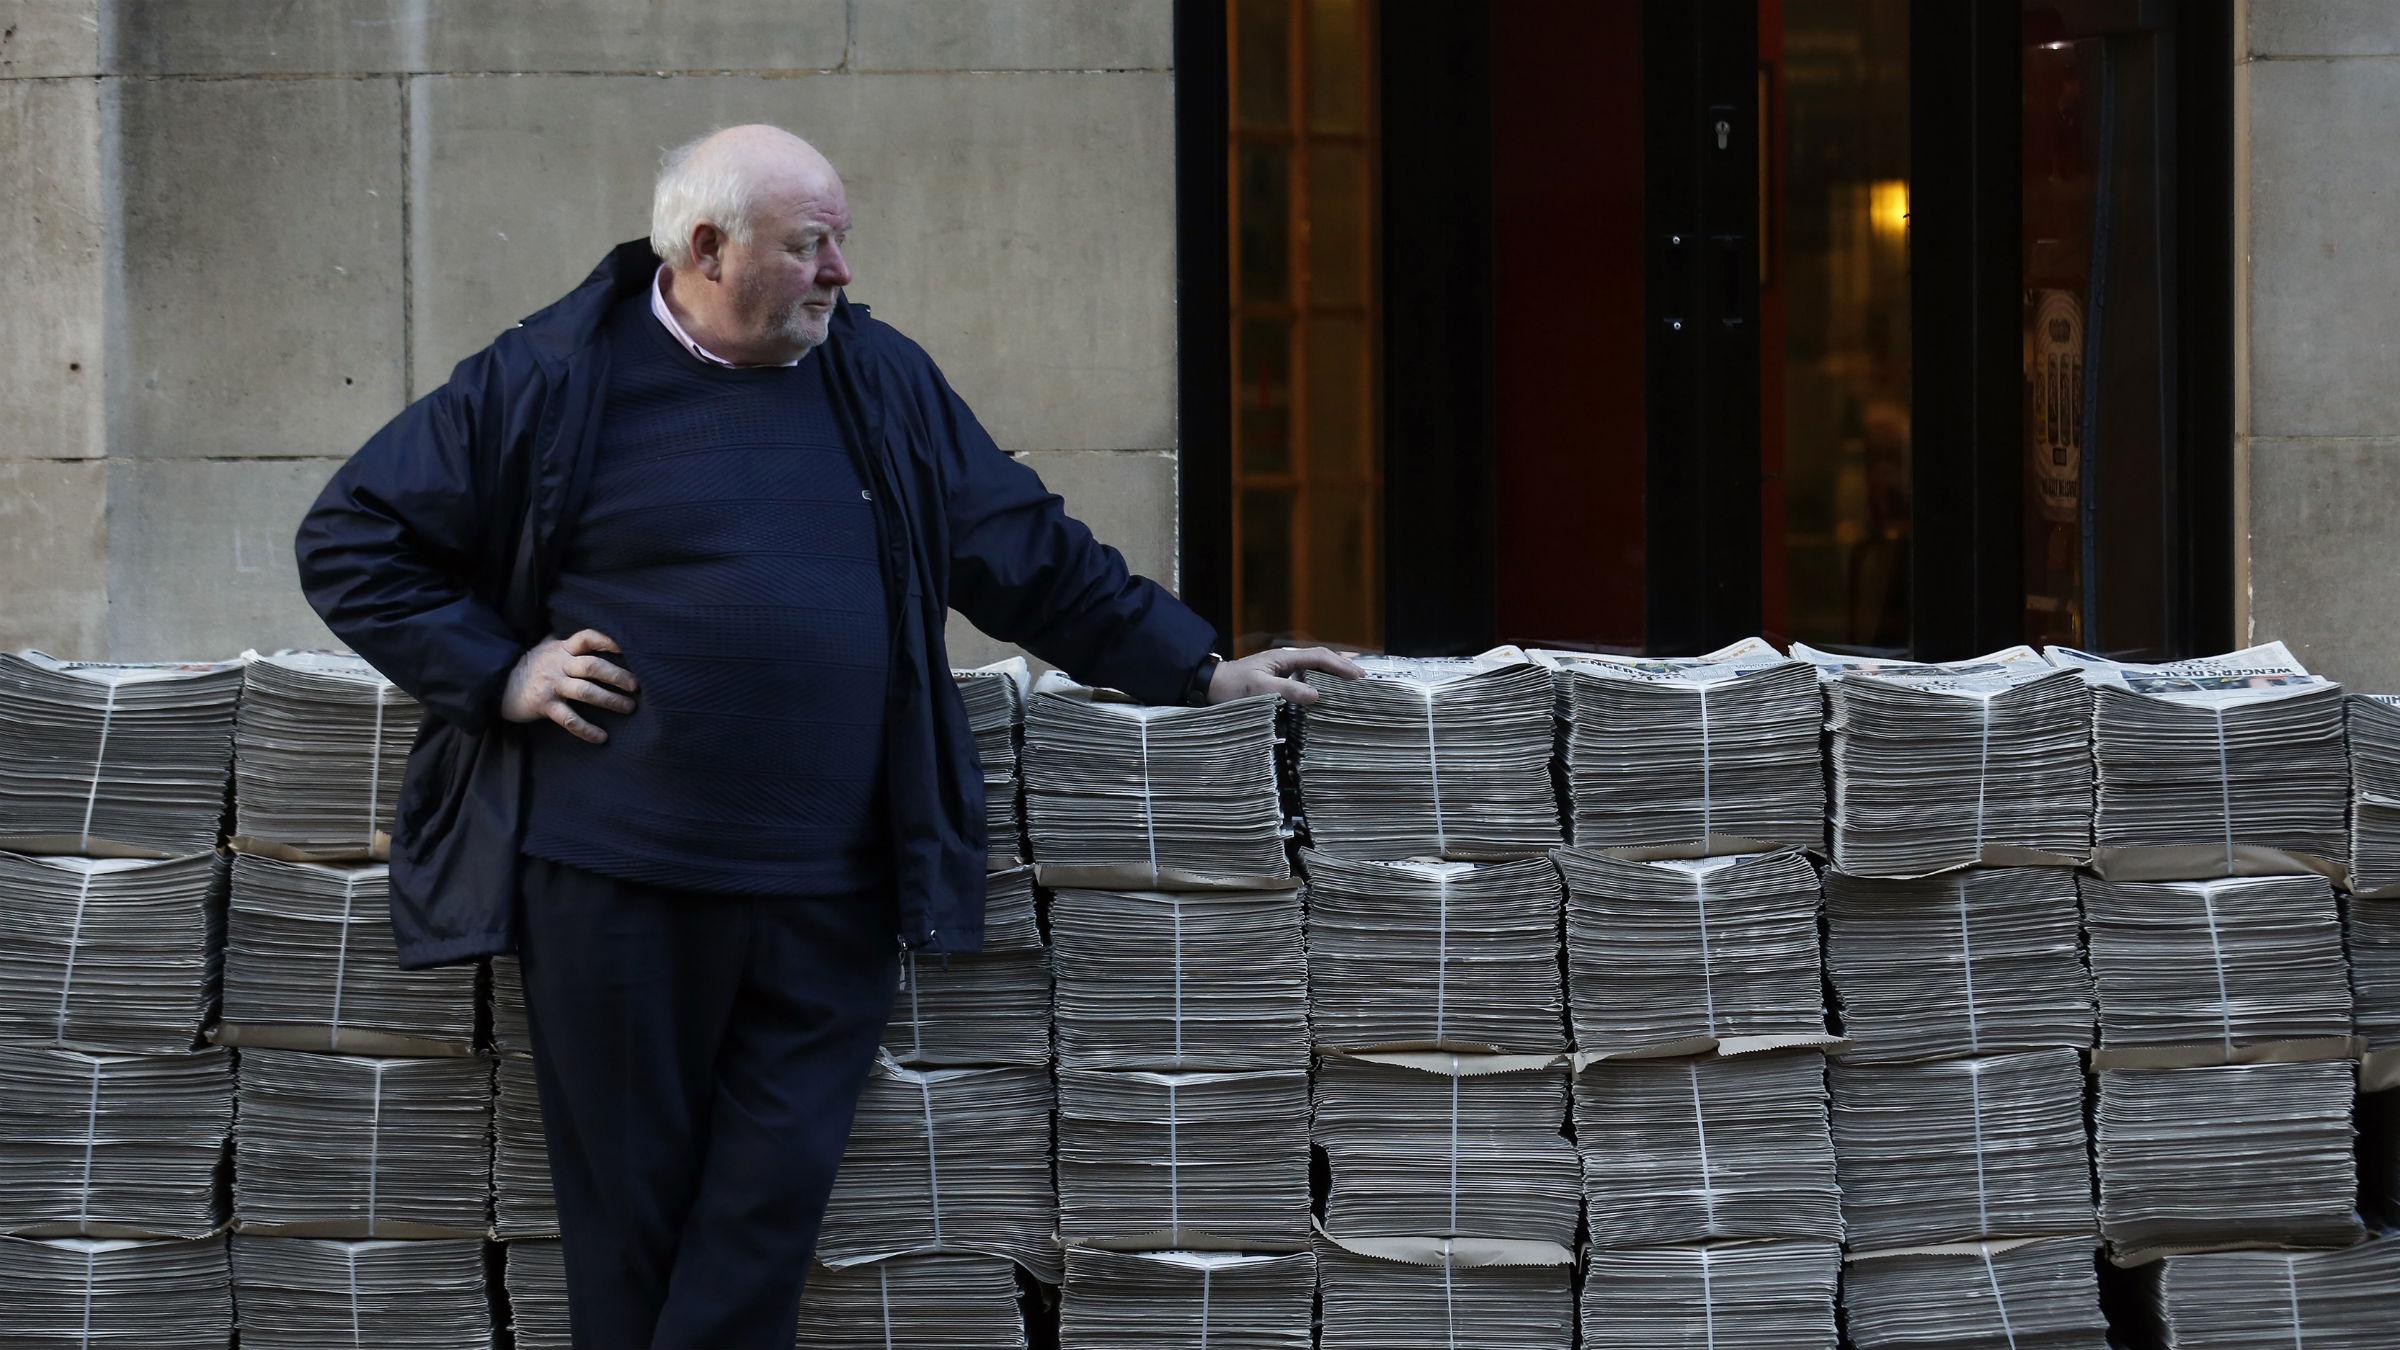 Man standing next to stacks of newspaper